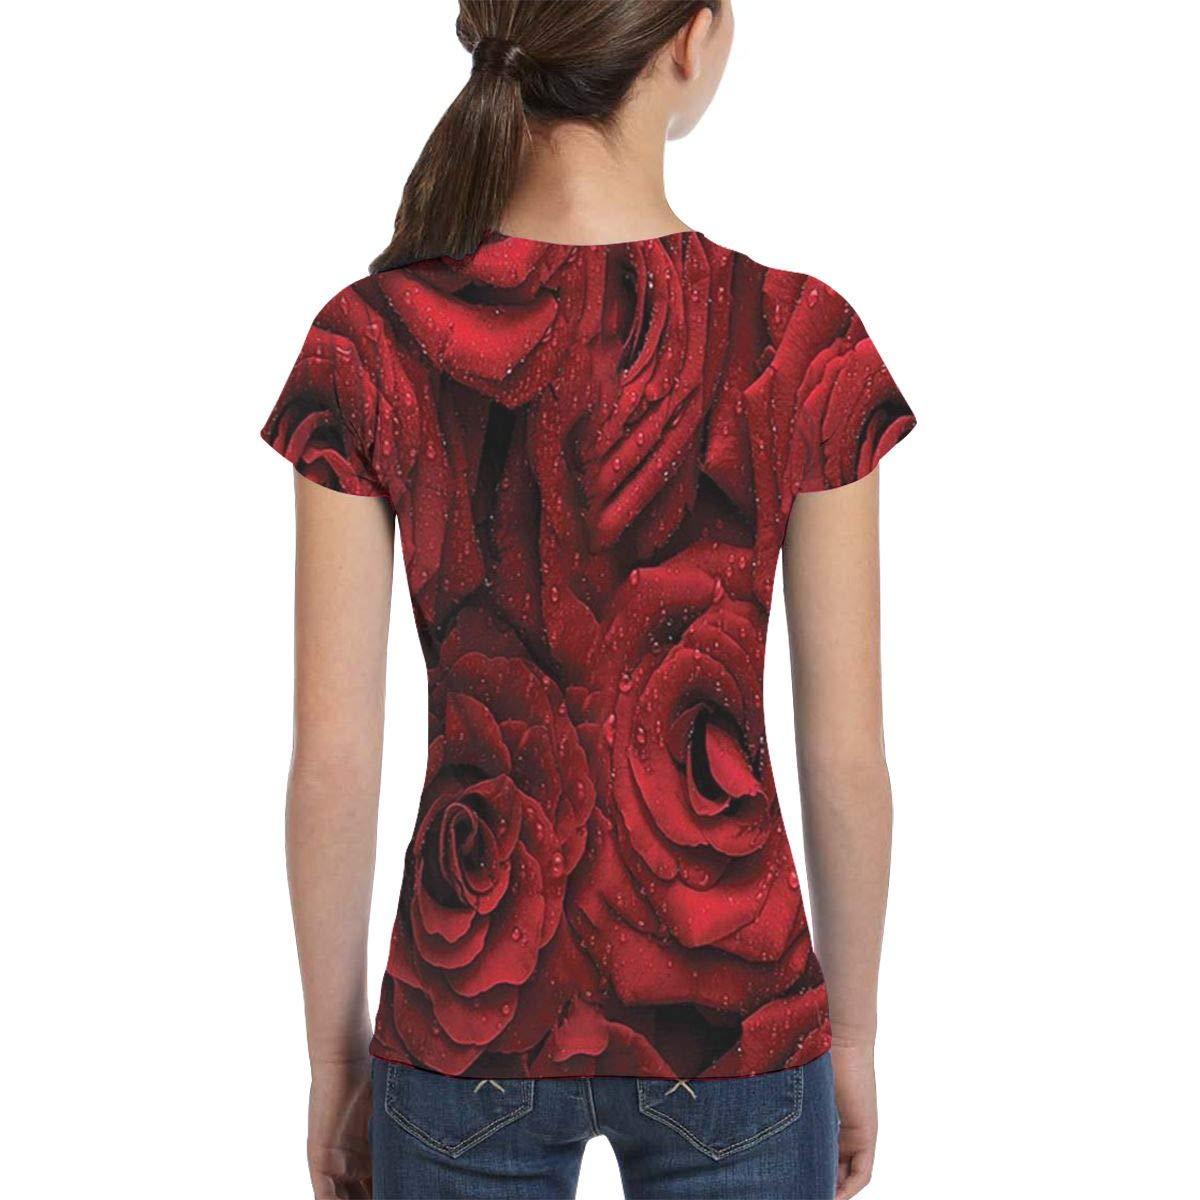 Casual Tunic Shirt Dress L6Nv4o@A Girls Short Sleeve A Beautiful Dripping Rose T-Shirts XS-XL